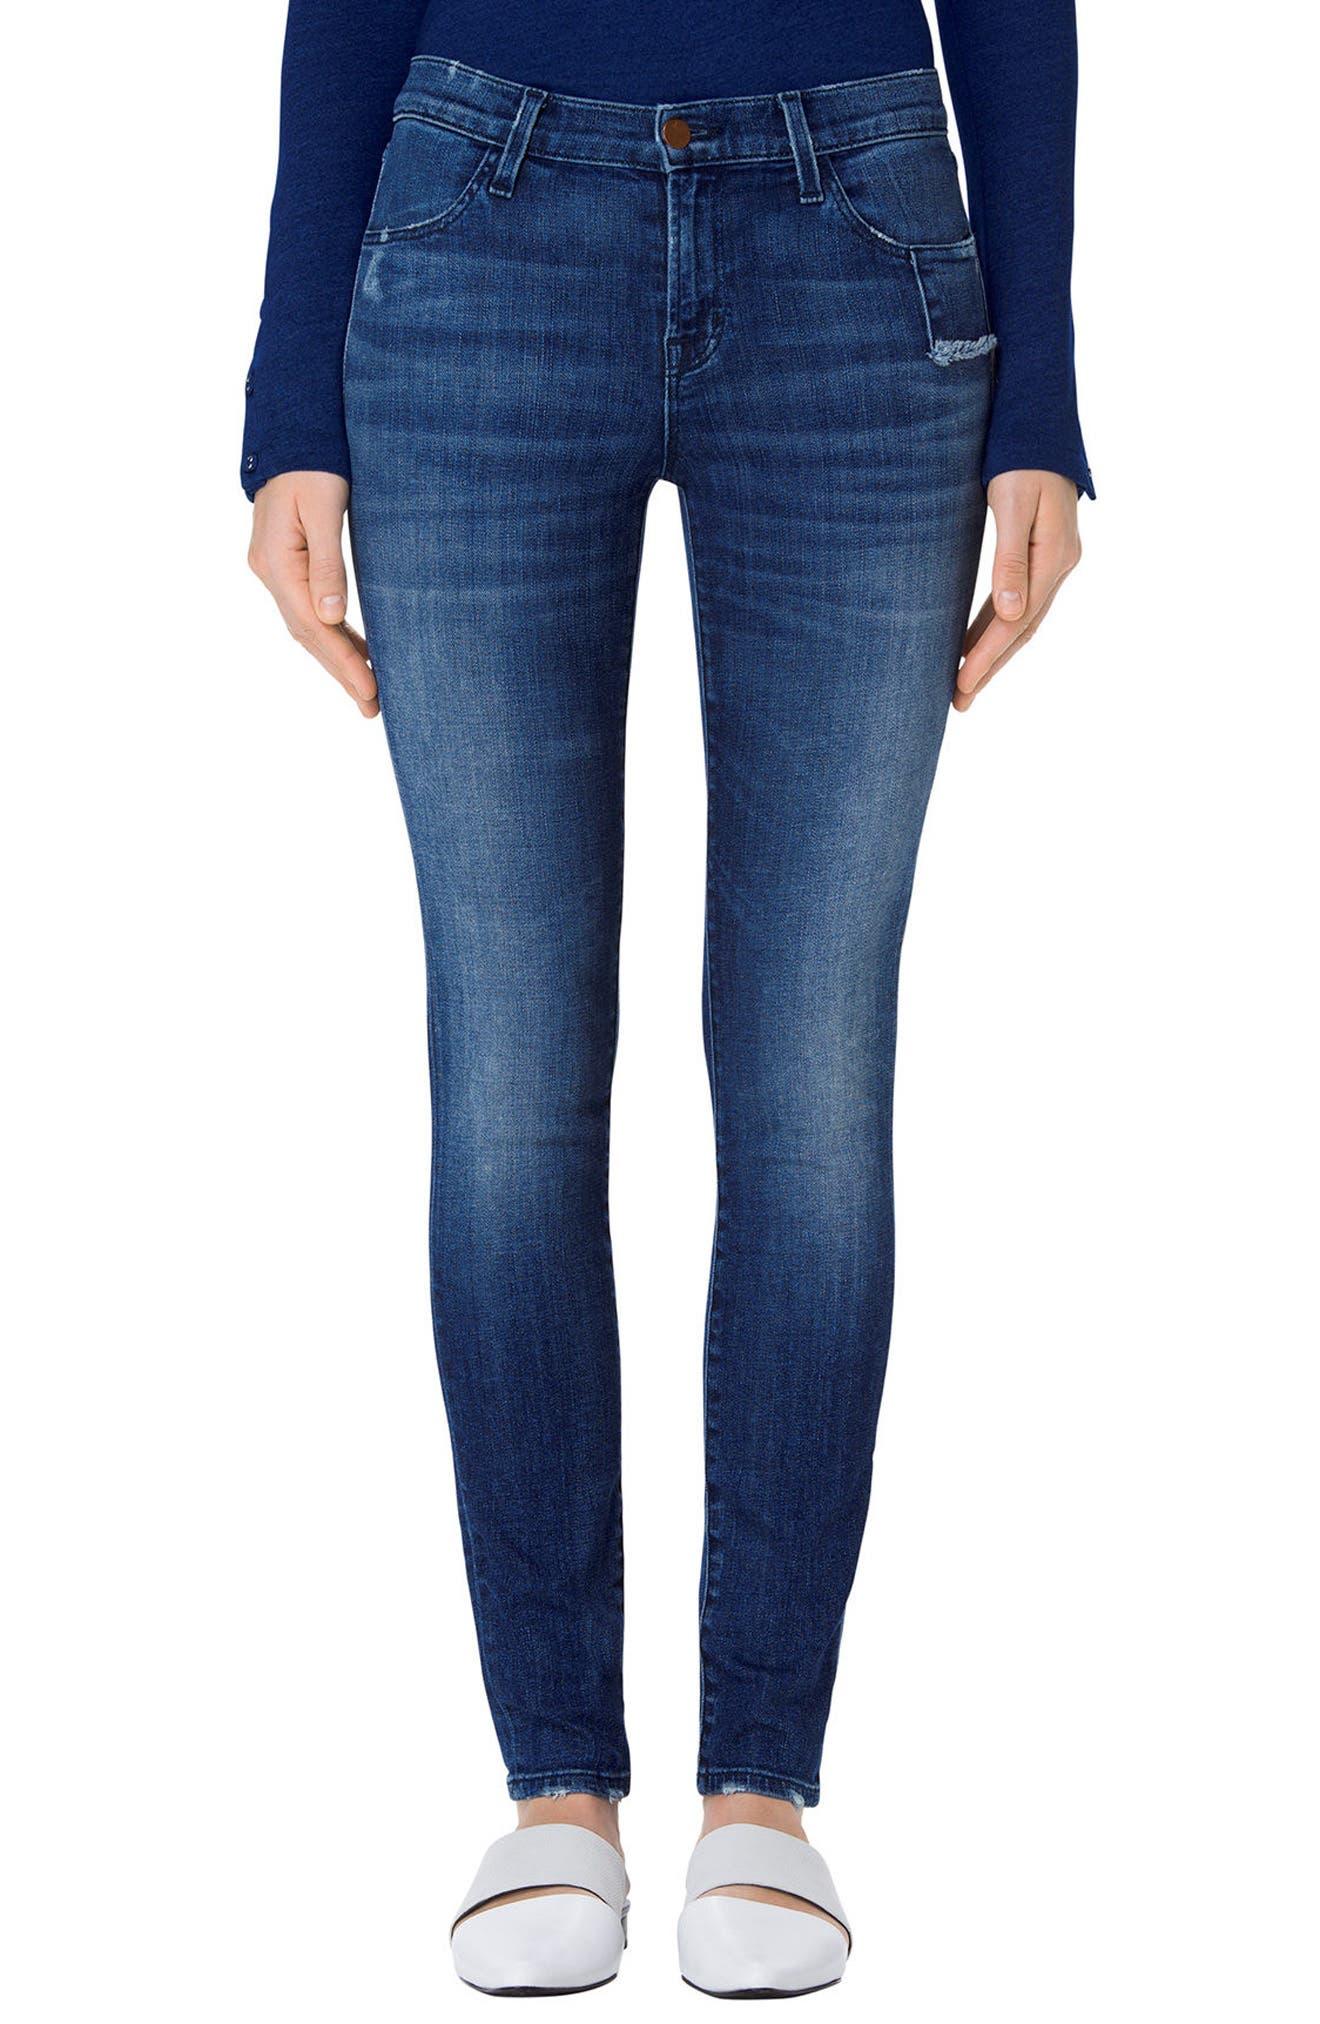 620 Skinny Jeans,                             Main thumbnail 1, color,                             470